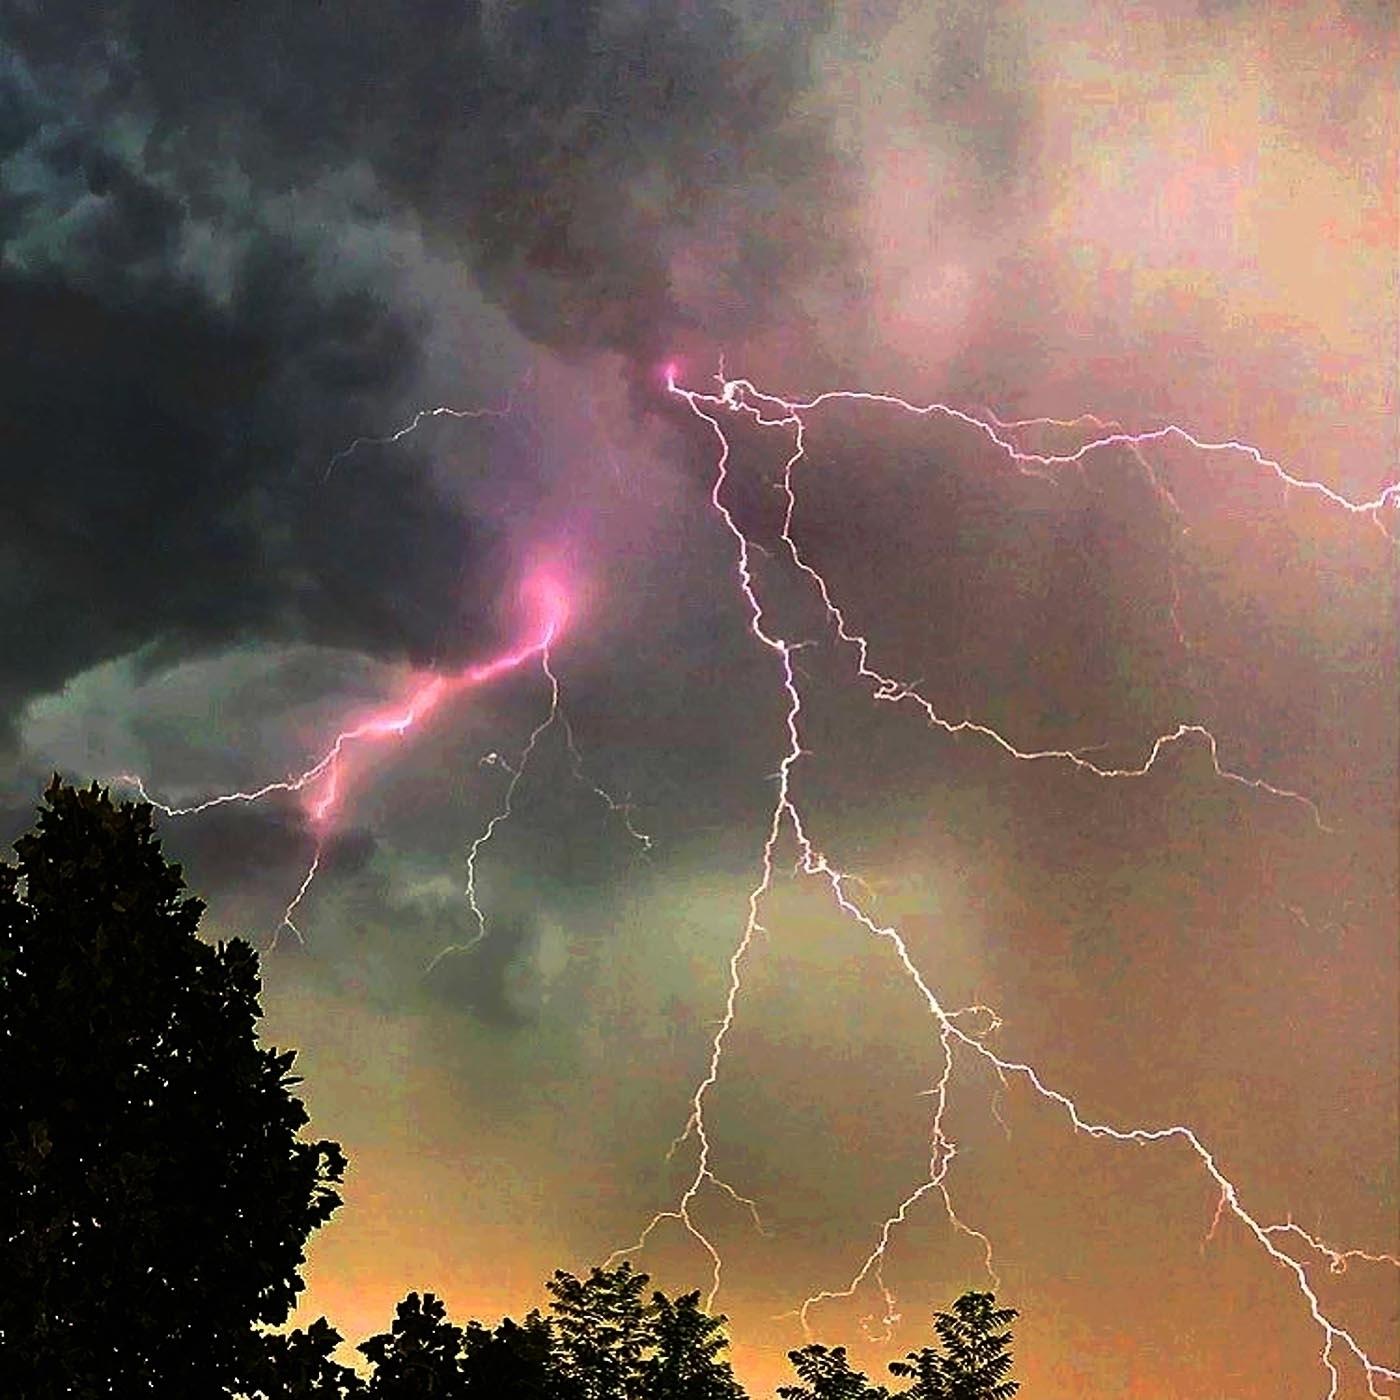 pink lightning California fores - zygzwurx | ello